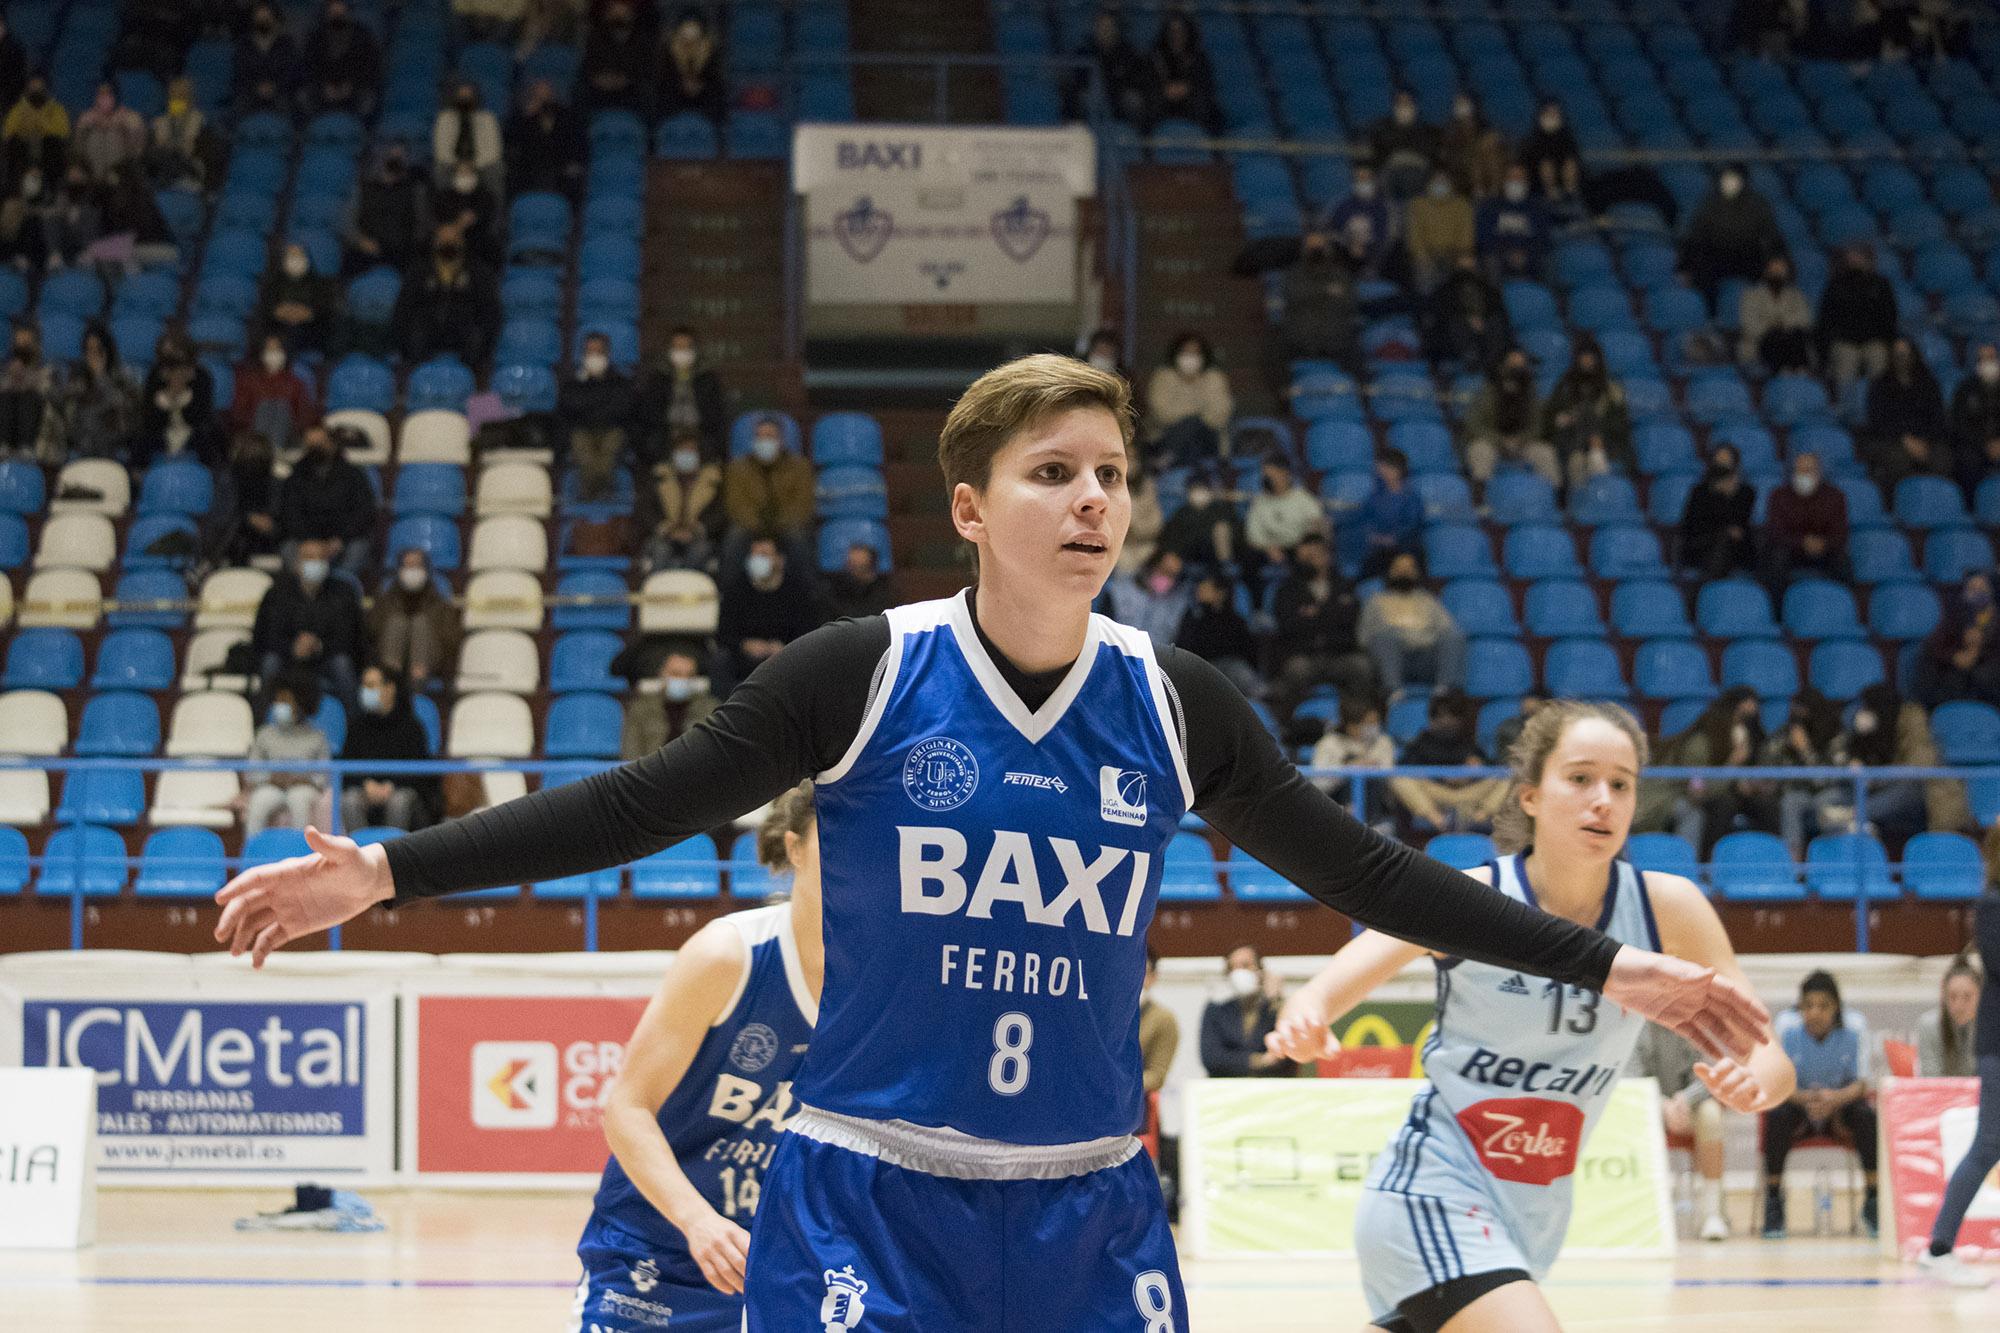 Patri Cabrera seguirá co BAXI Ferrol / UNI FERROL